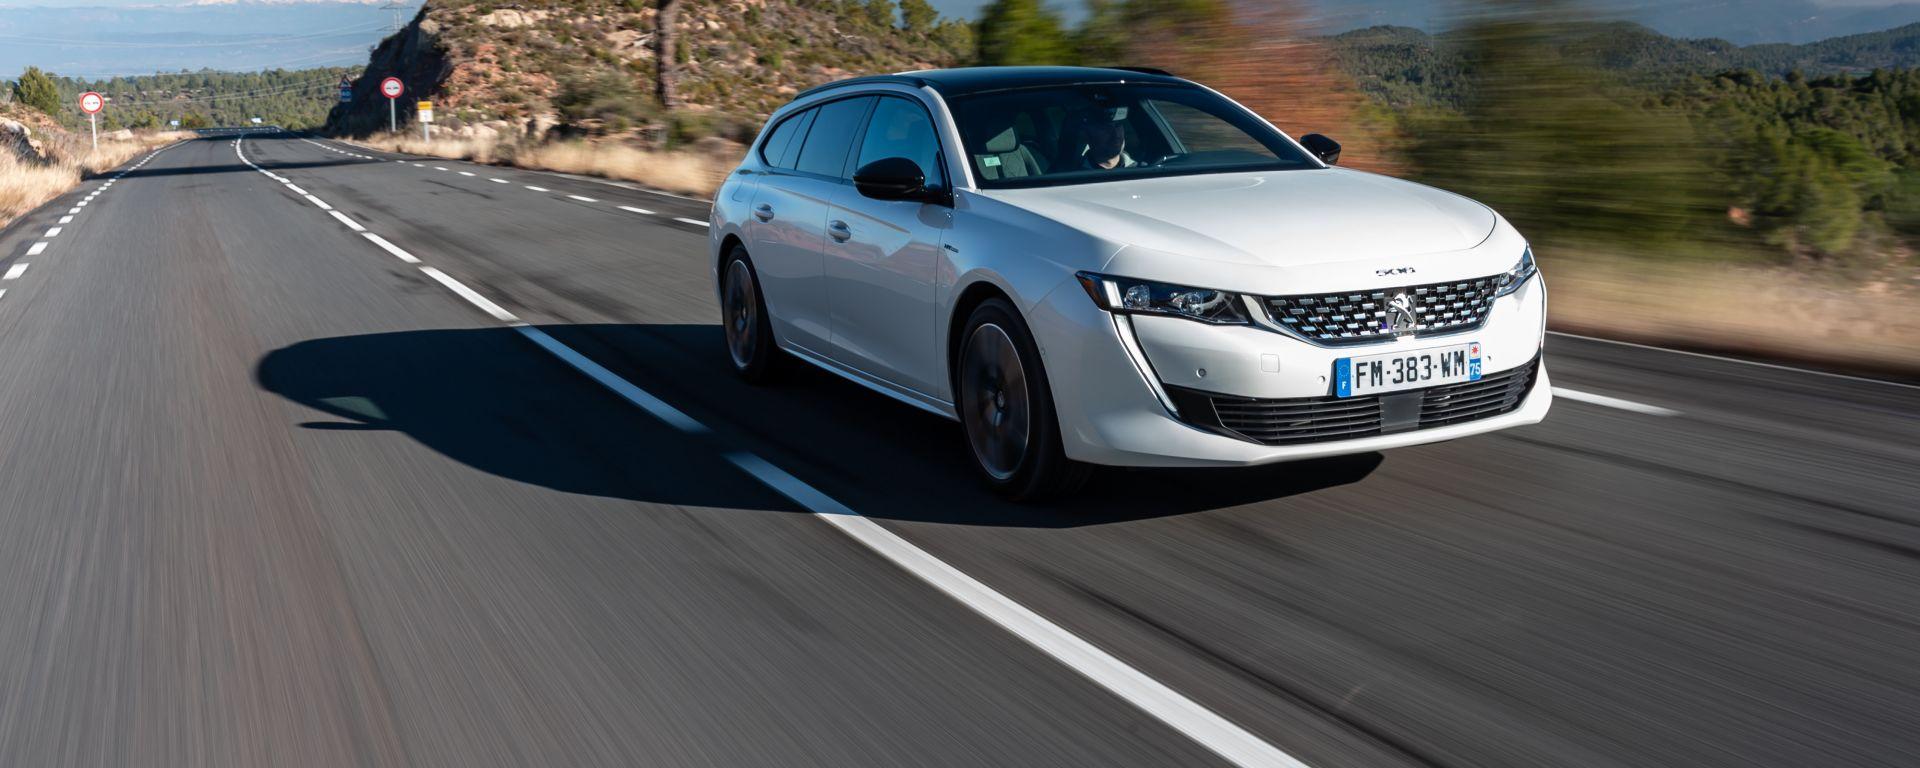 Peugeot 508 Hybrid 2020 movimenti